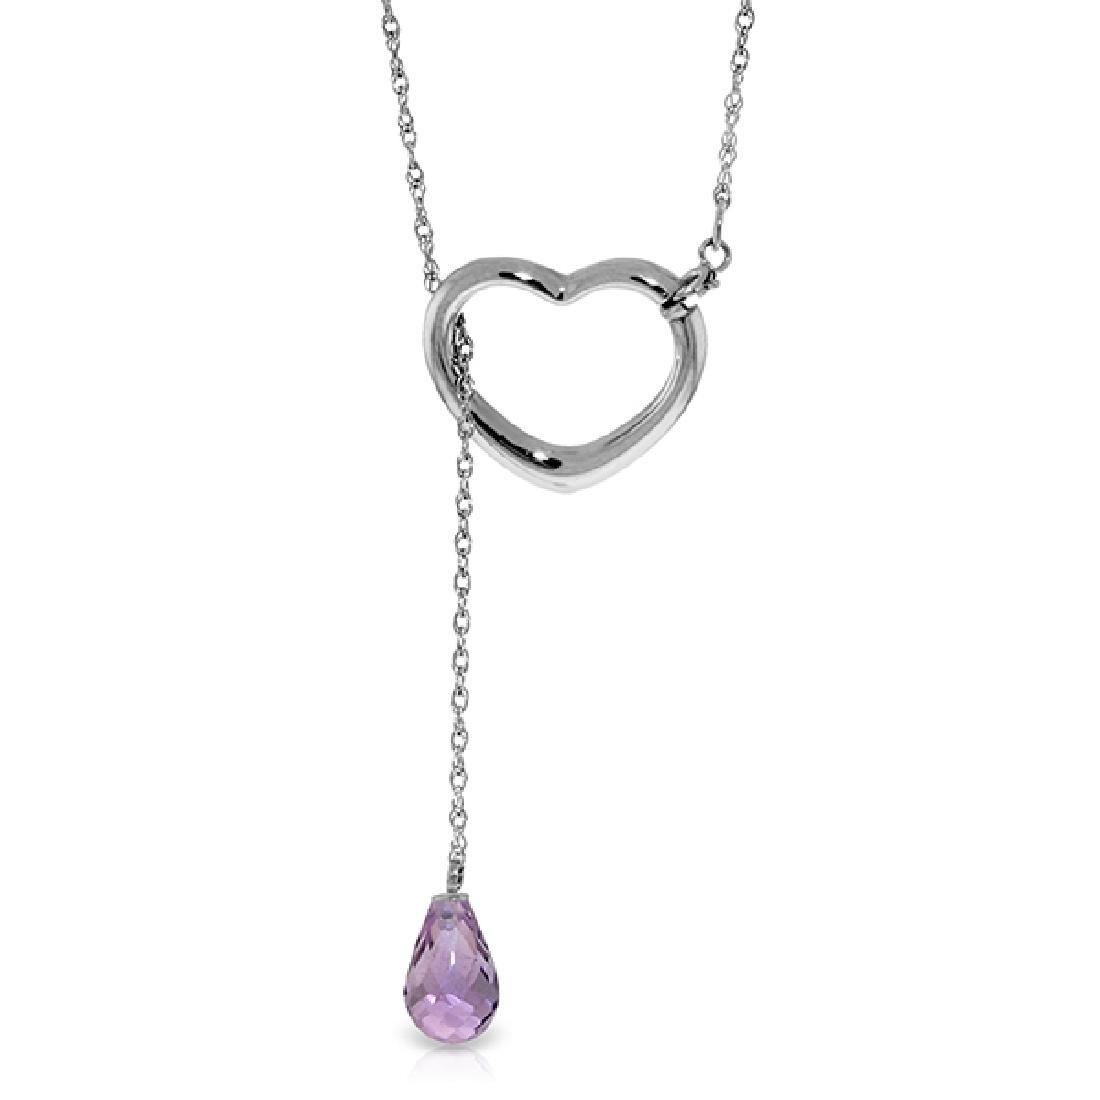 Genuine 2.25 ctw Amethyst Necklace Jewelry 14KT White